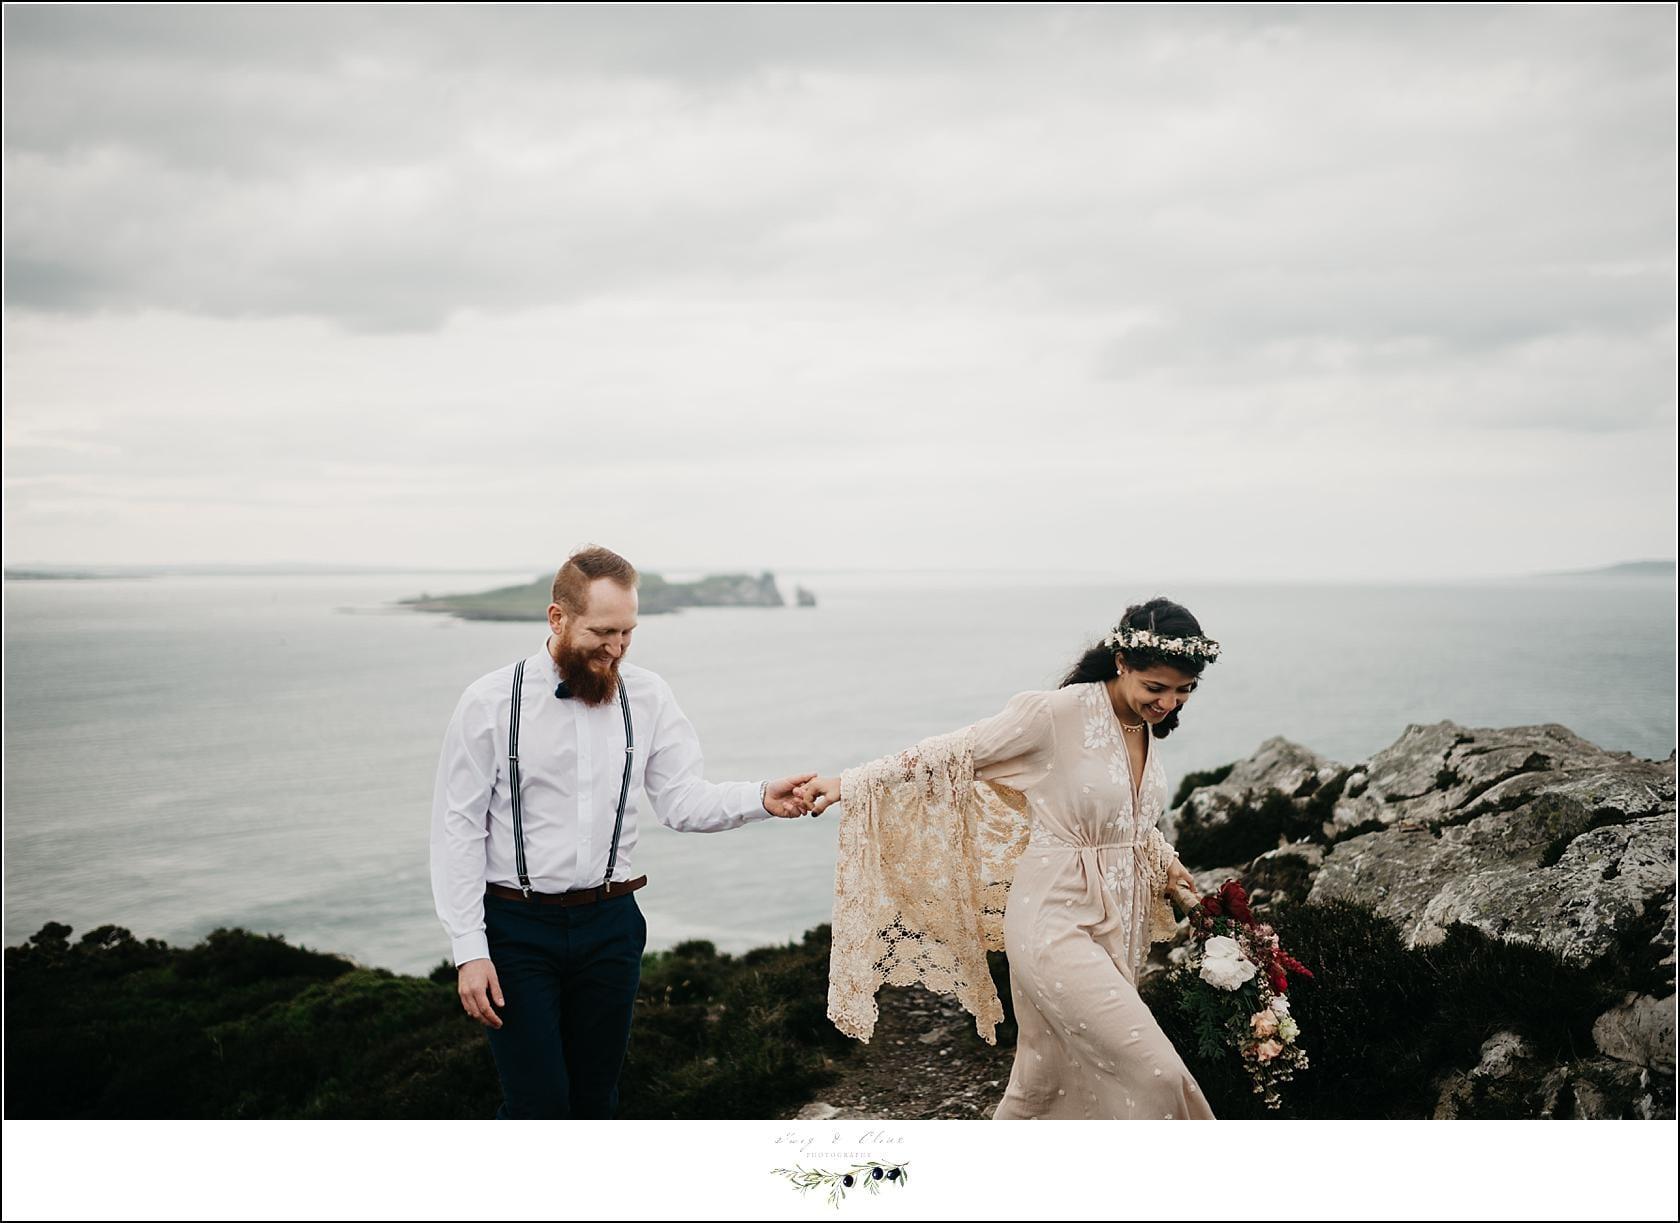 wedding photography workshop in Ireland